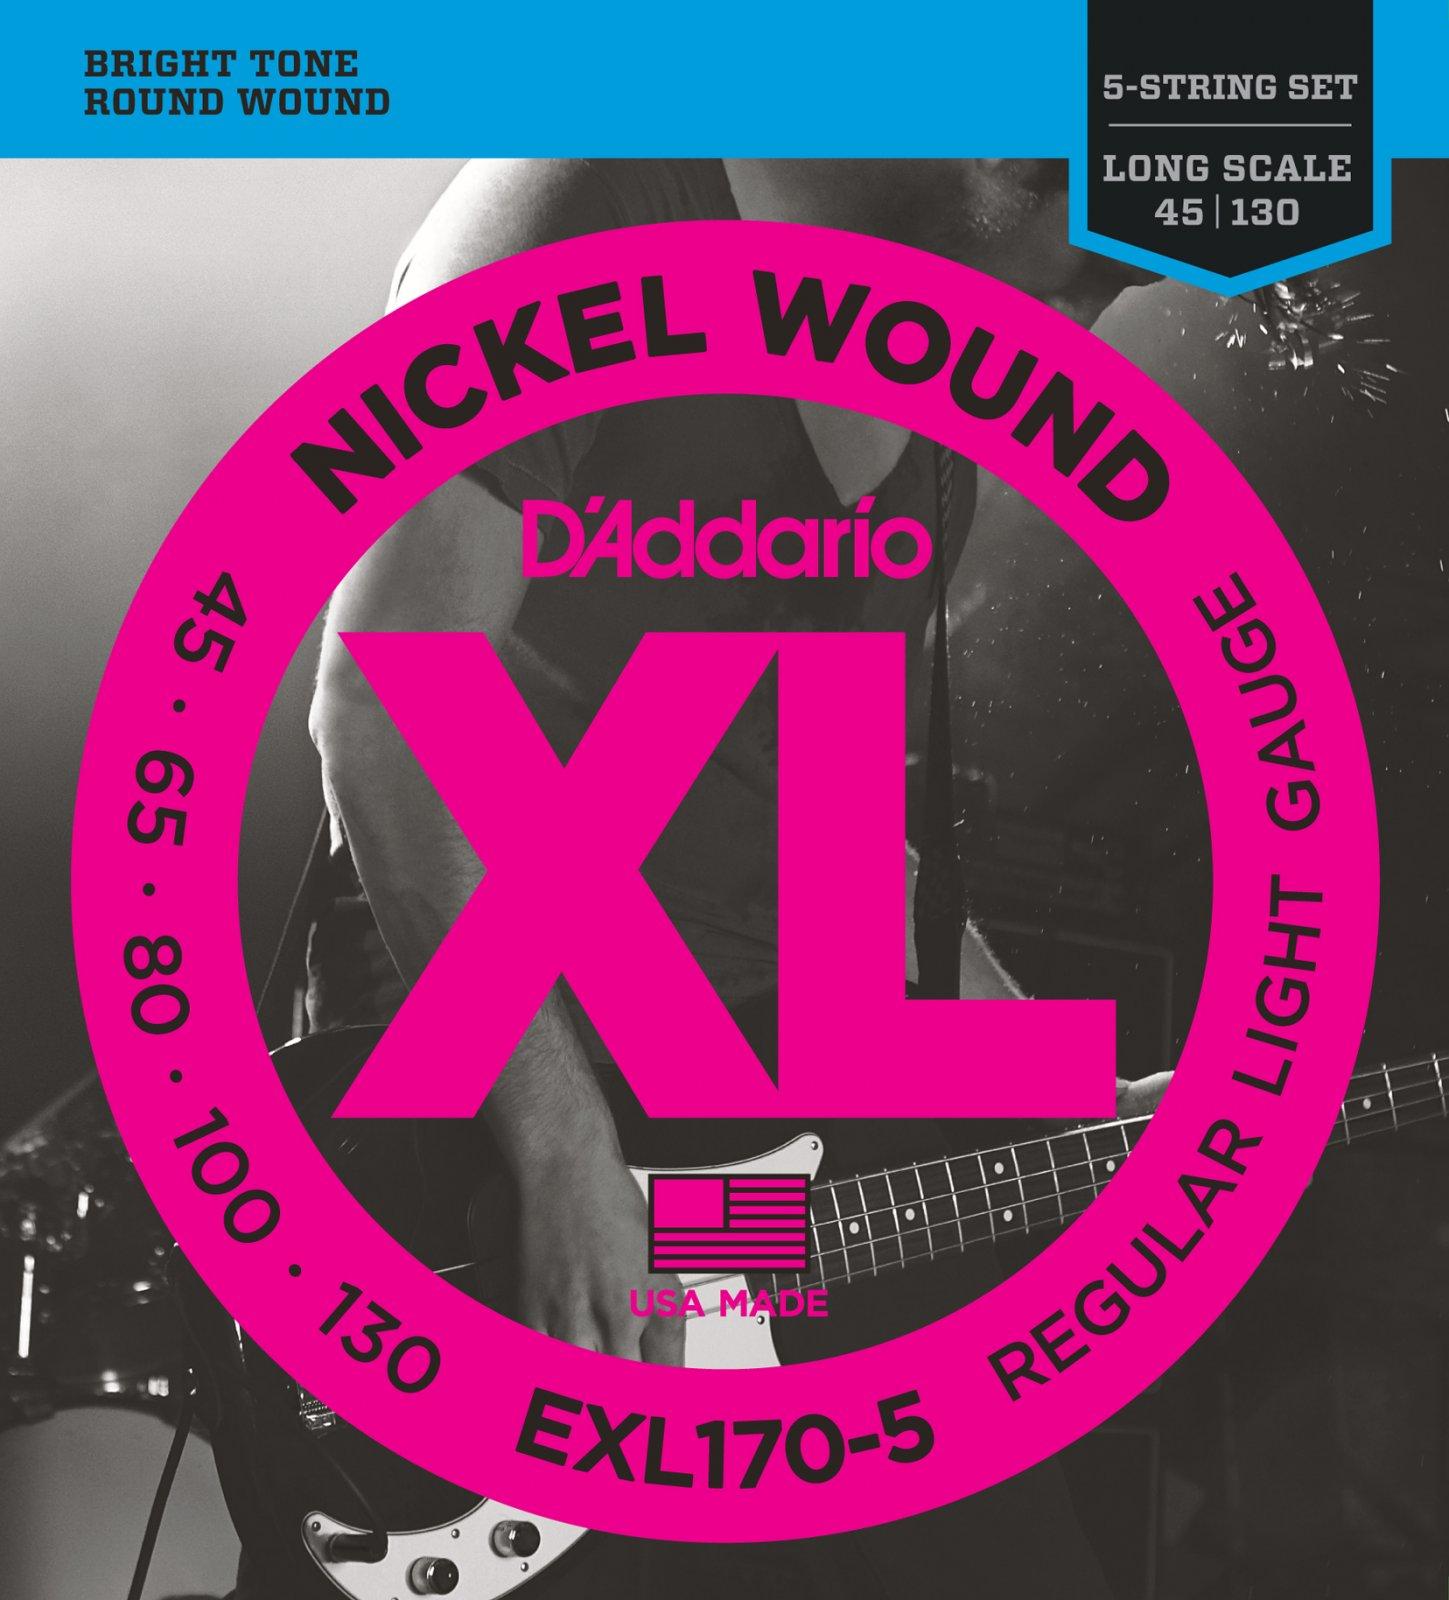 D'Addario XL Nickel Wound EXL170-5 Bass Guitar Strings, 5-String, Long Scale, Light, 45-130